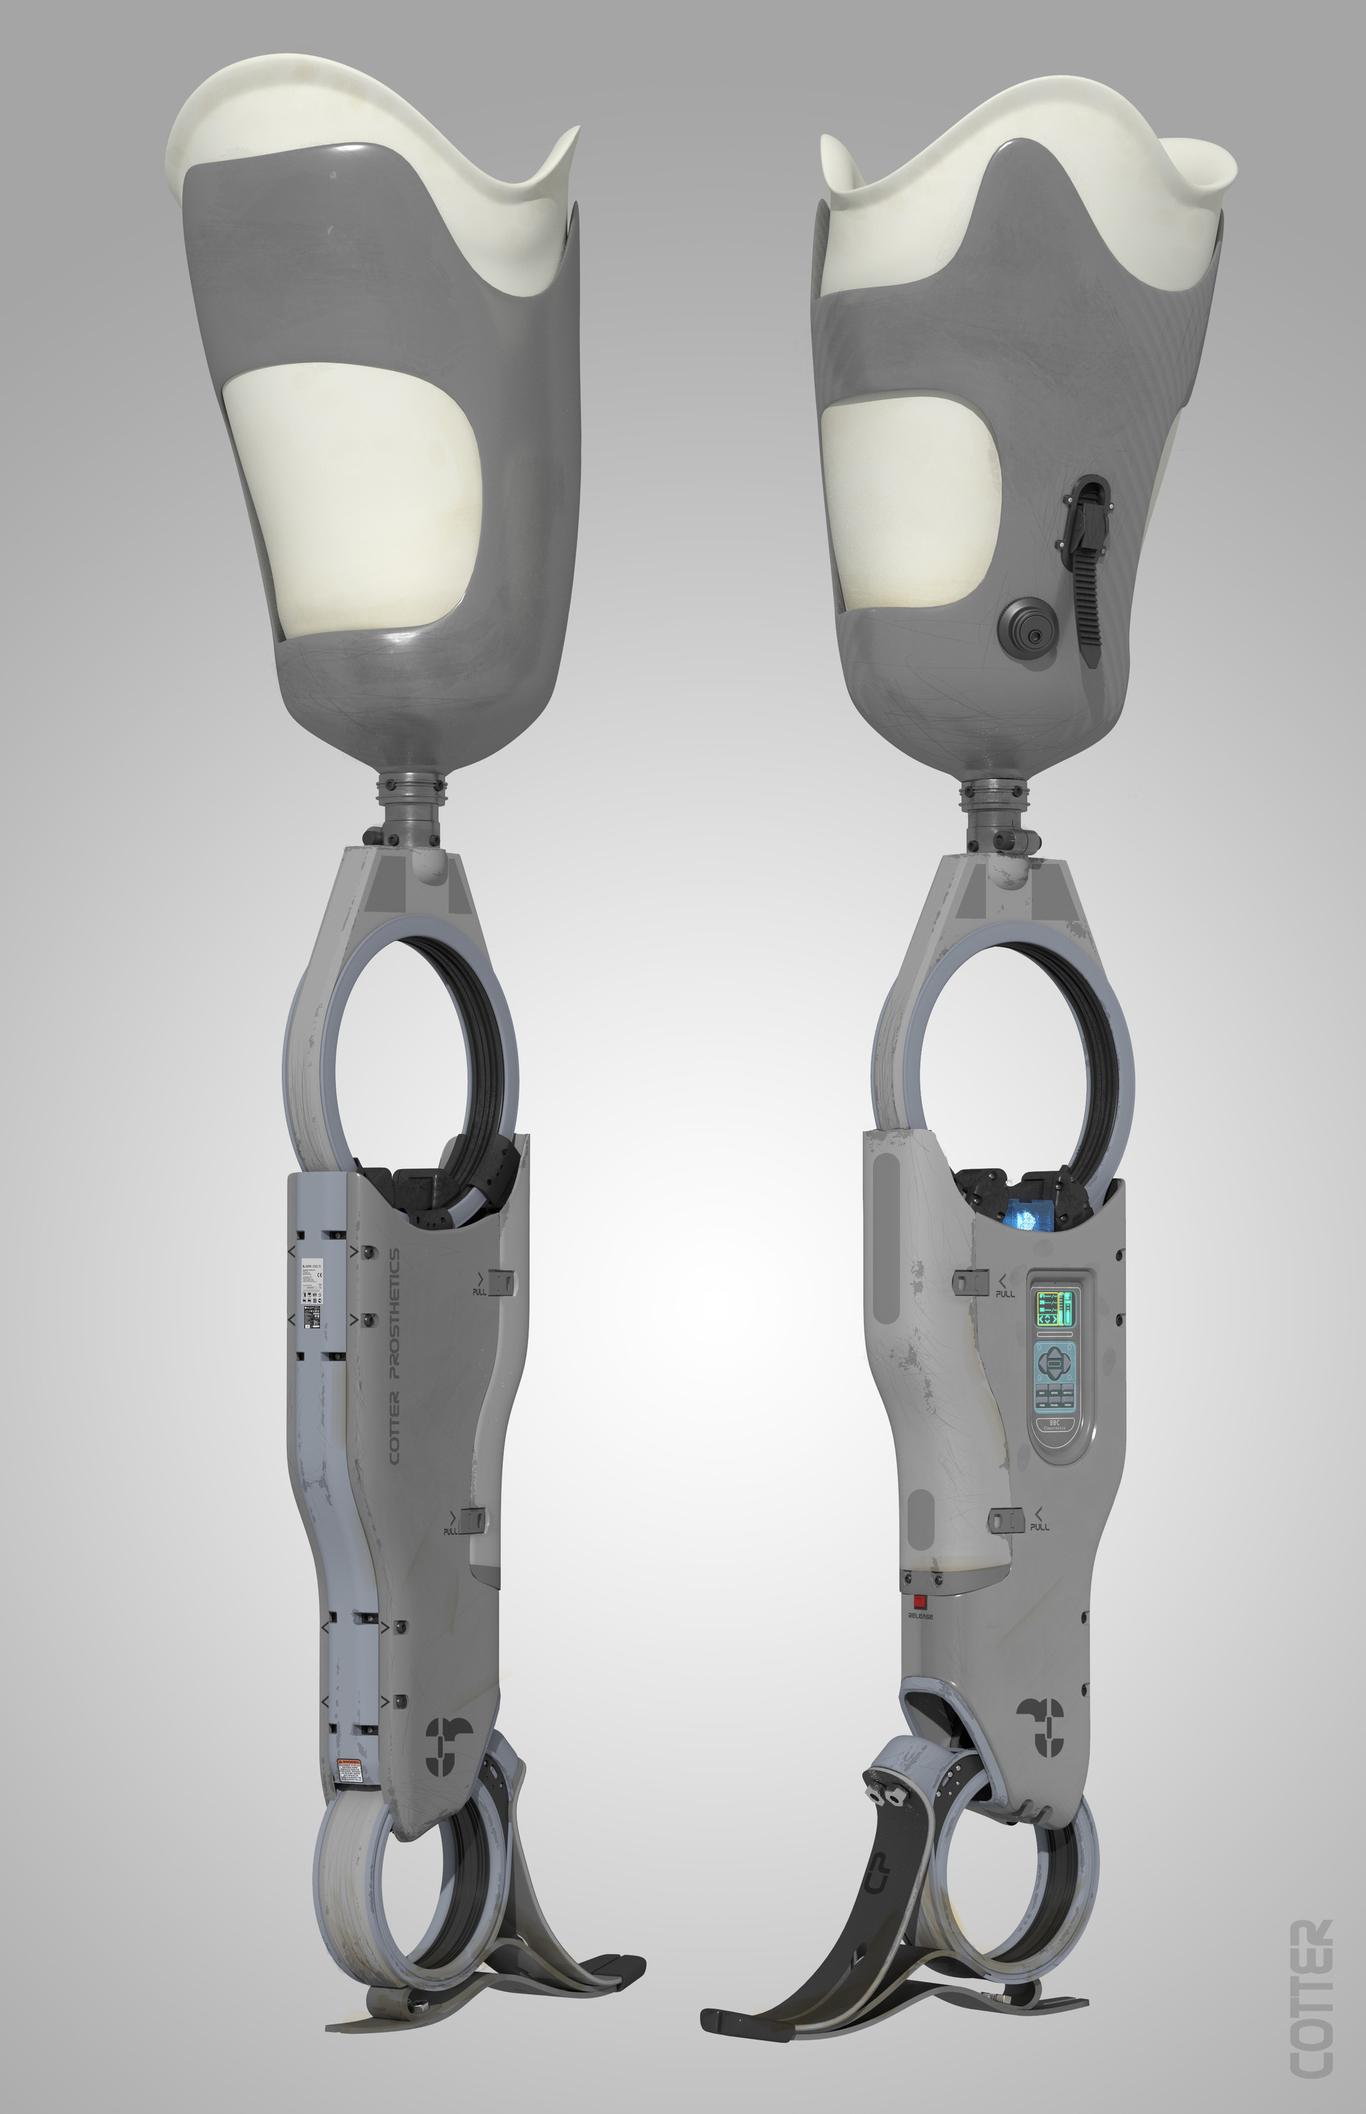 Parallaxpunch prosthetic leg desig 1 2e7b2f6c xngo